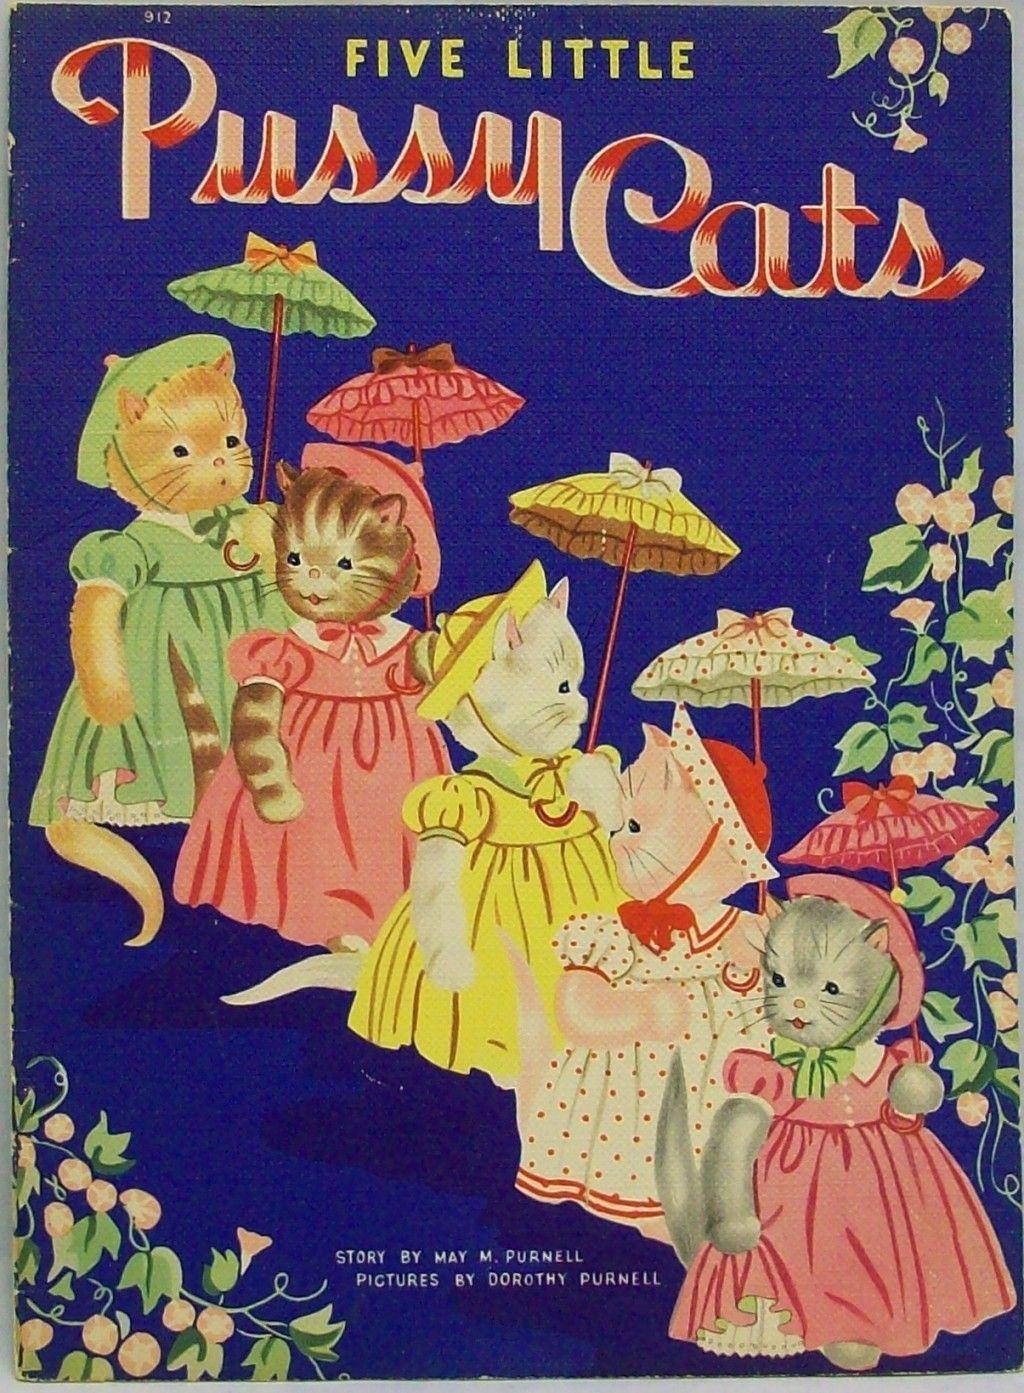 Vintage 1940 Whitman book 'FIVE LITTLE PUSSY CATS', May Purnell via eBay ^^(casino)^^우리카지노 》LONG17.COM 《 코리아카지노 카지노다모아 카지노다모아 코리아 우리 우리카지노  코리아카지노 http://cmd17.com/ 카지노다모아 카지노다모아 코리아 우리